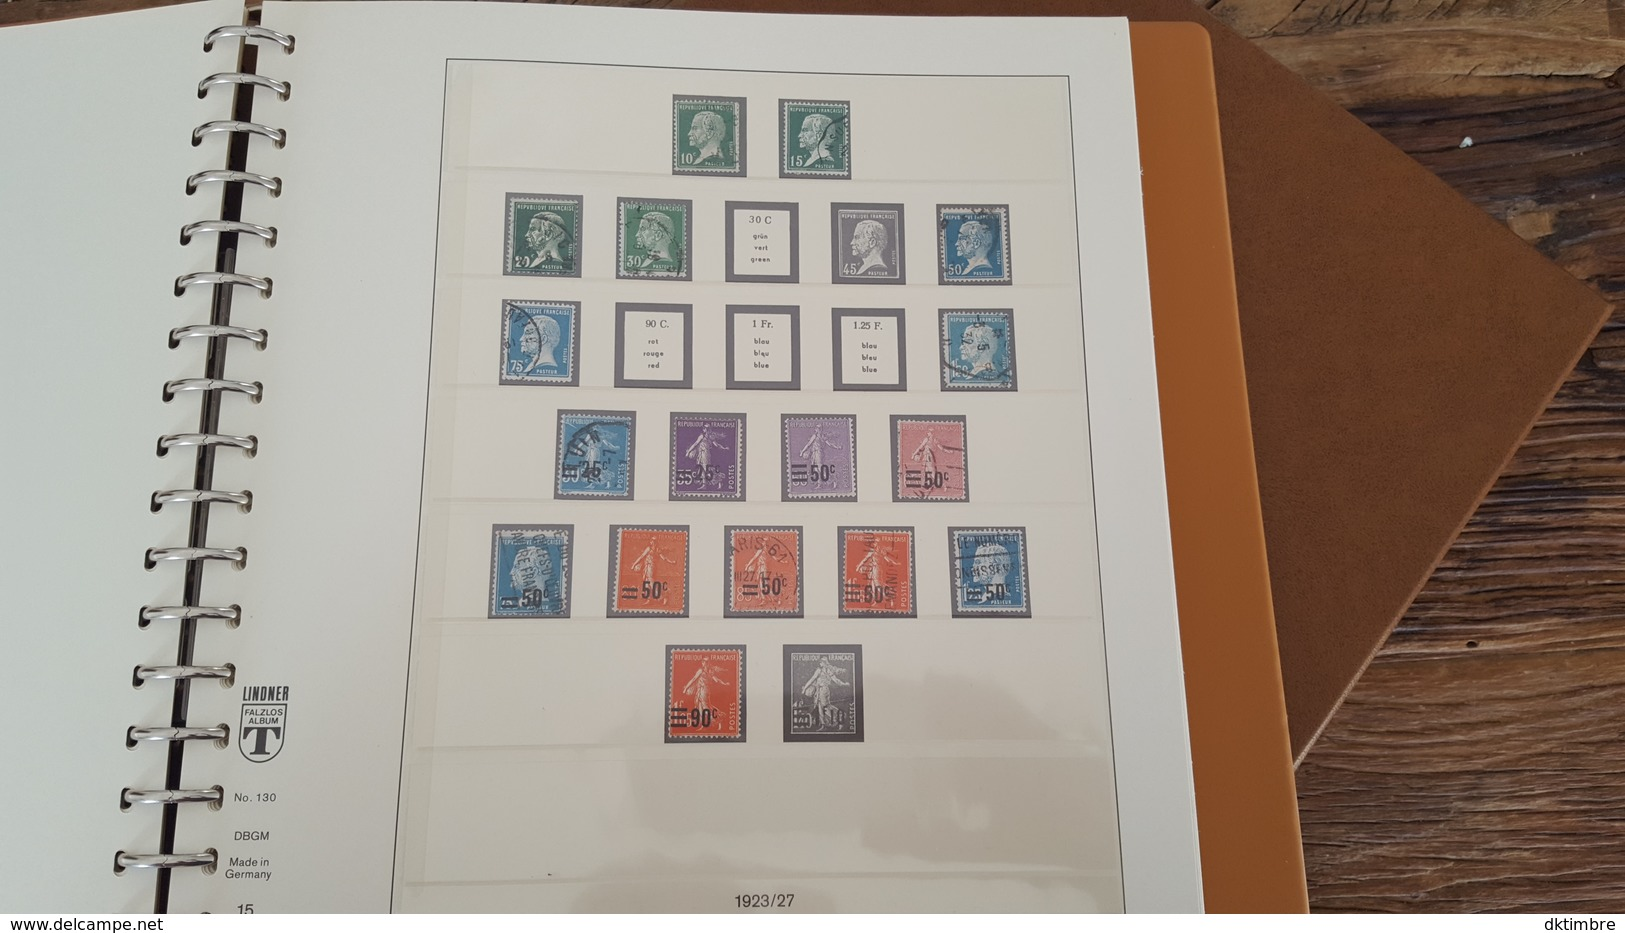 LOT 375678 ALBUM TIMBRE DE FRANCE LINDNER DE 1849 A 1940 TIMBRE NEUF* OBLITERE PORT A 10 EUROS - Stamps